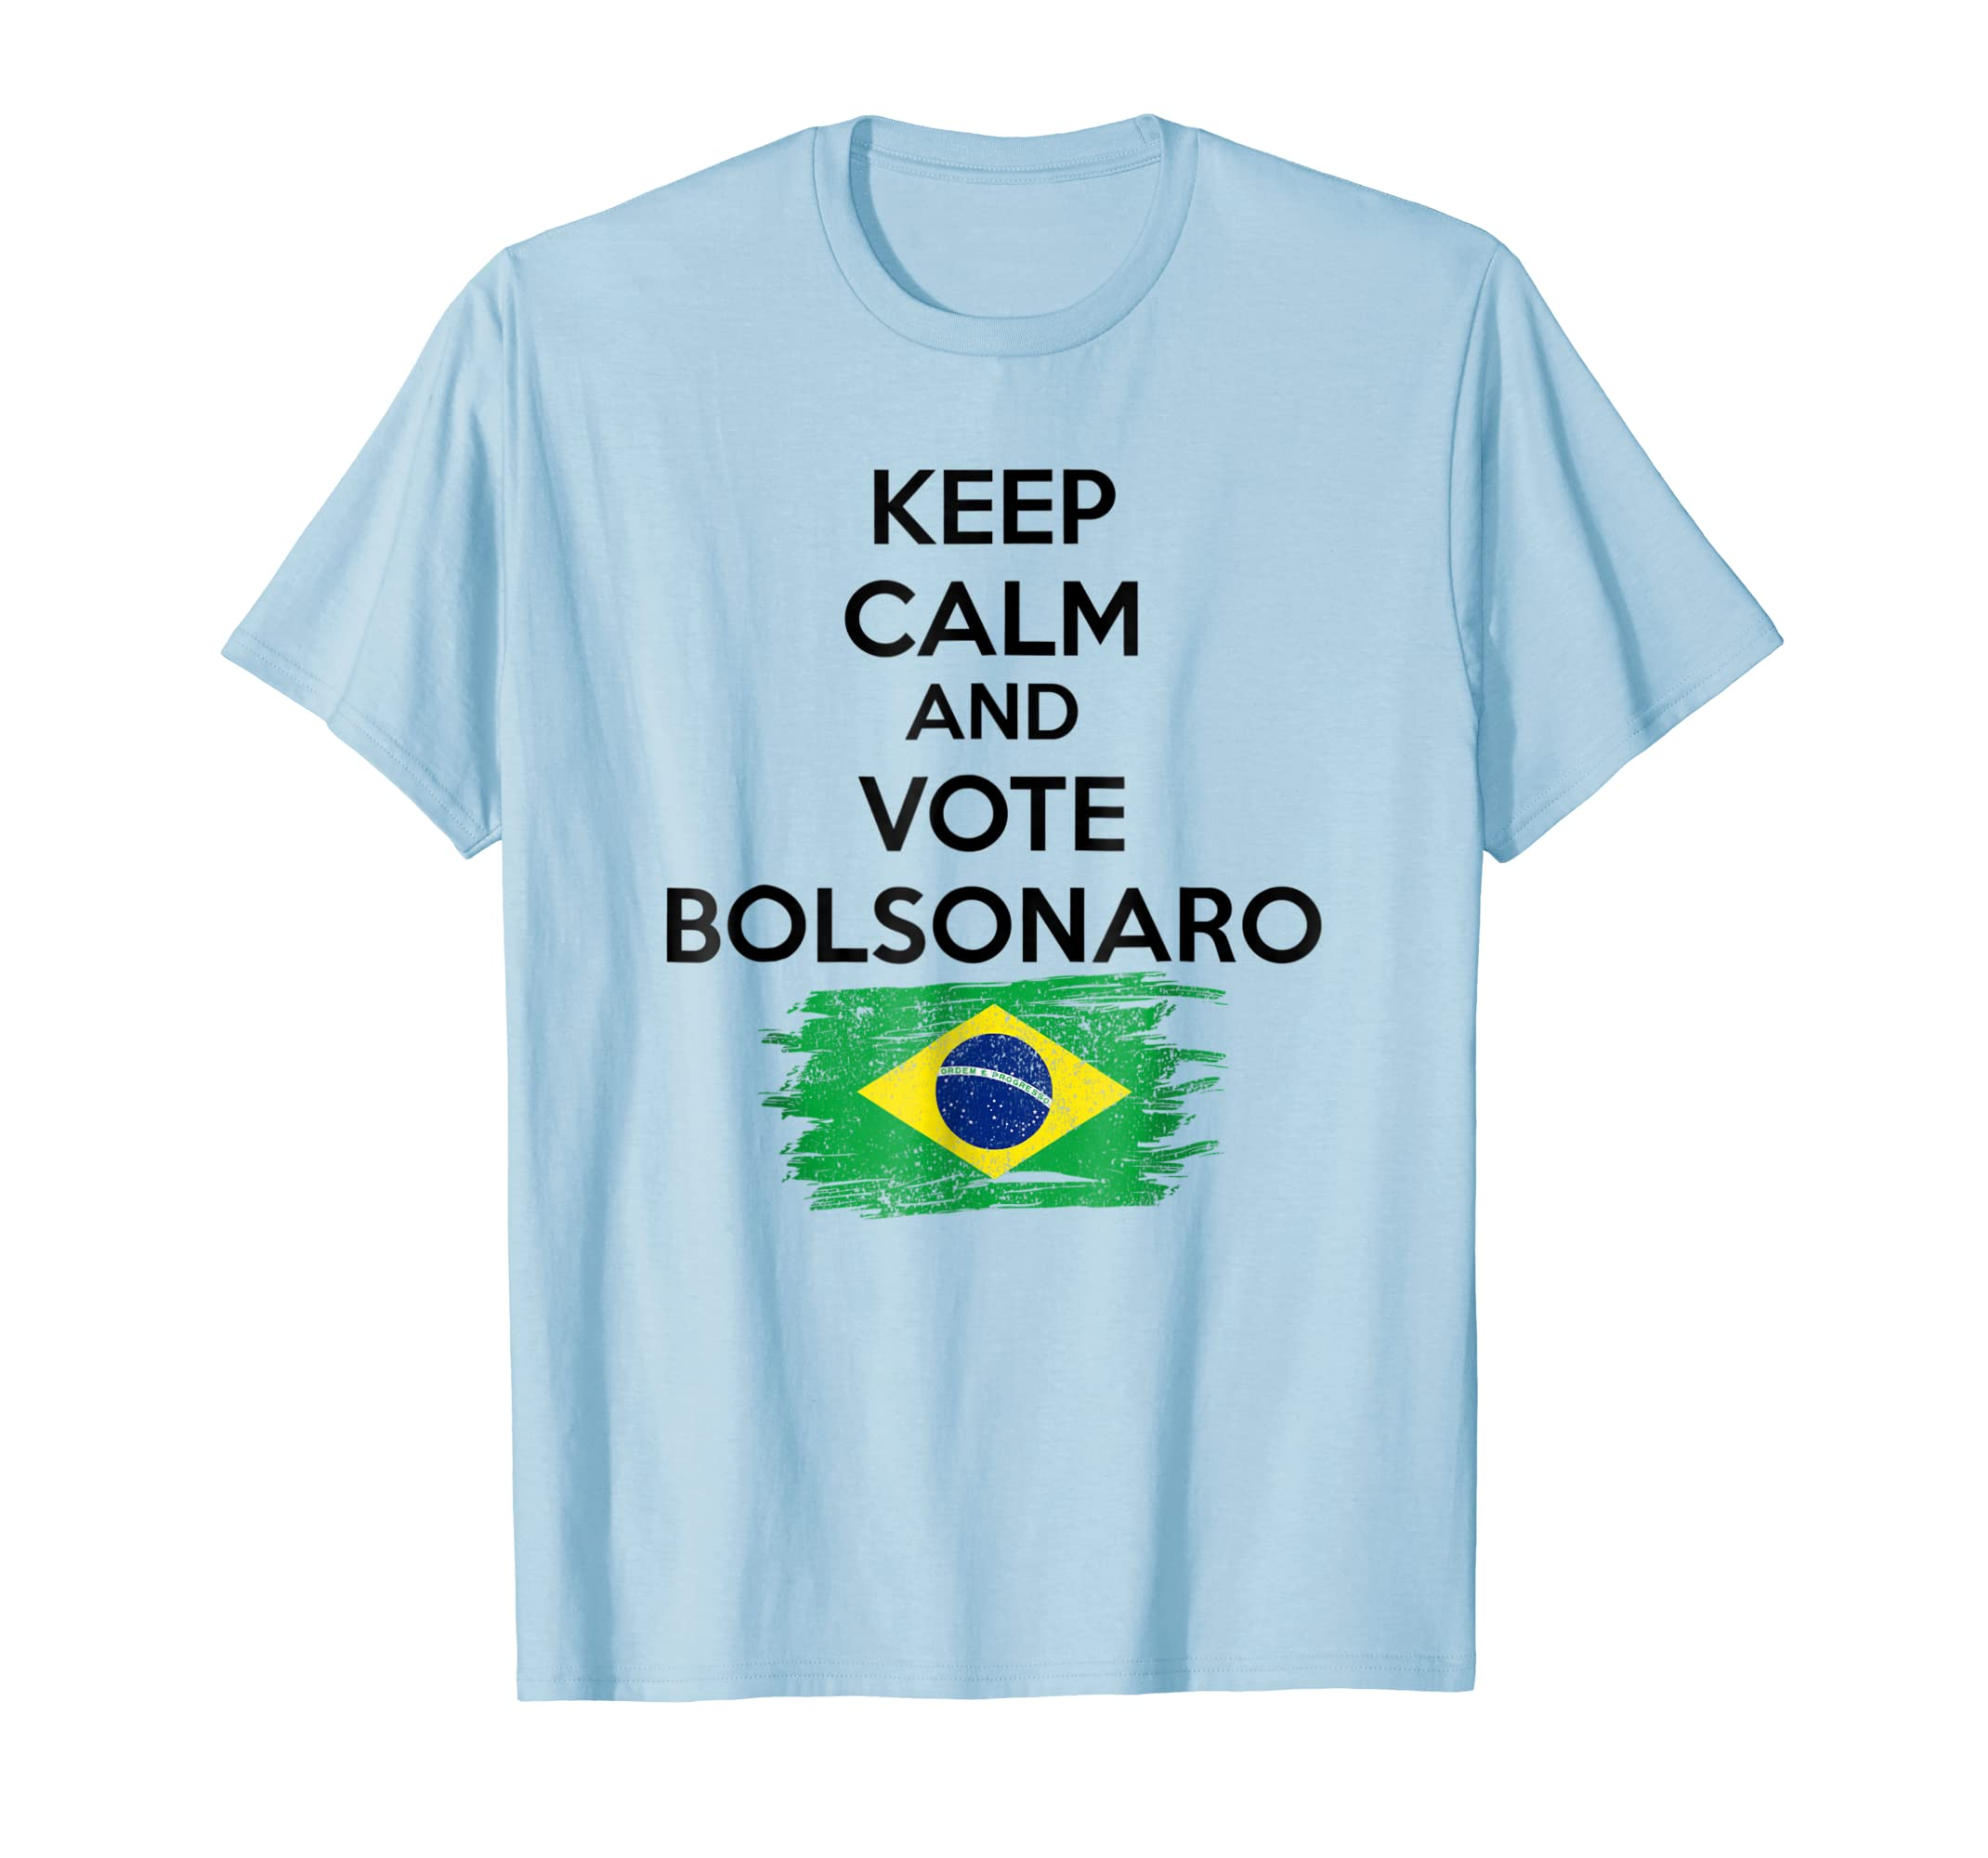 Bolsonaro Presidente 2018, Brazilian Election T Shirt-ln